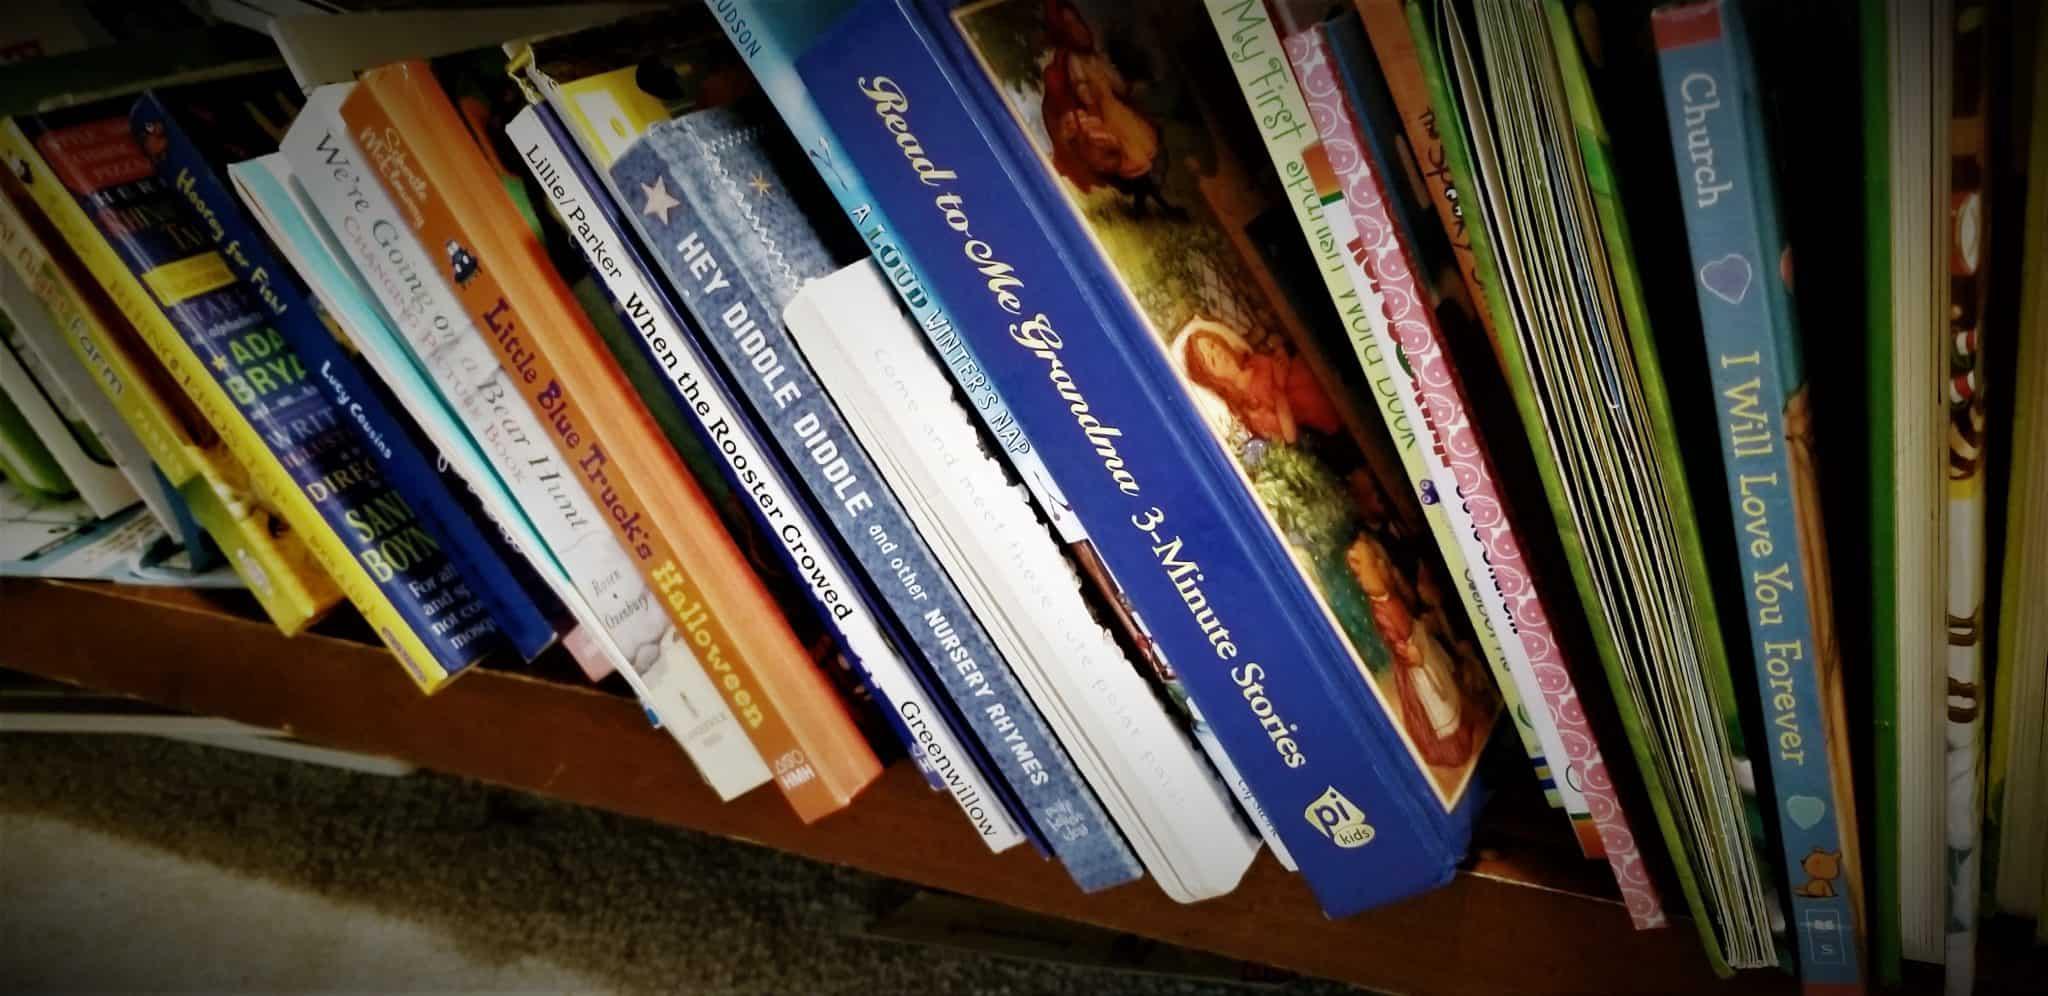 baby proofing hacks- childproofing a bookshelf